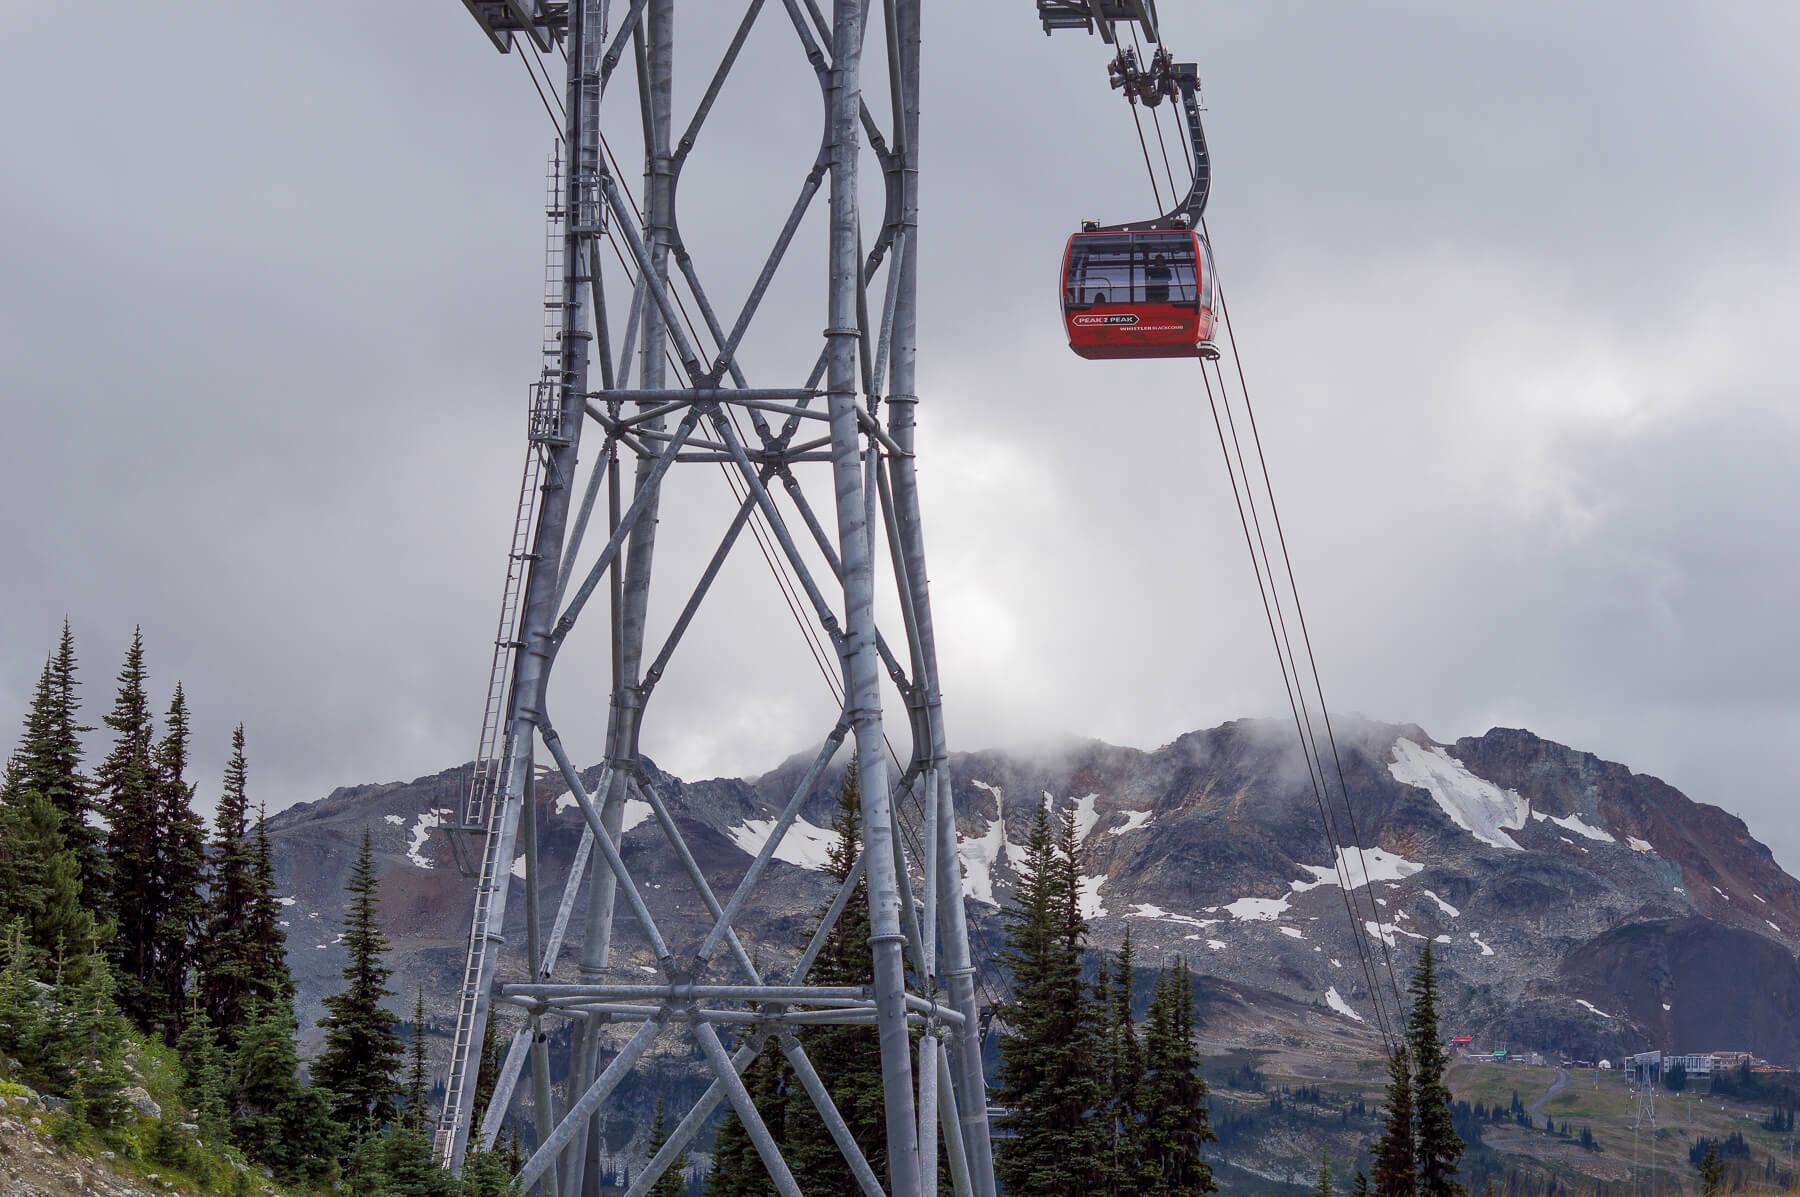 The Peak 2 Peak Gondola in Whistler